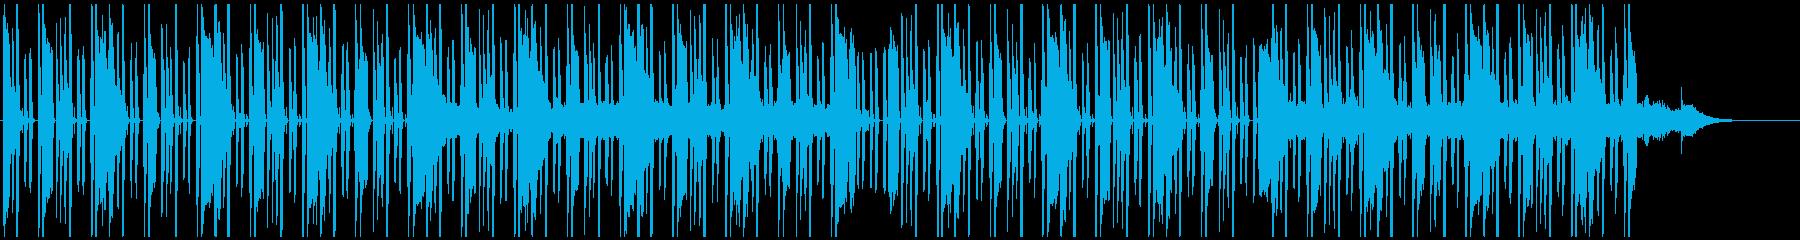 【LOFI HIPHOP】深夜集中Eの再生済みの波形